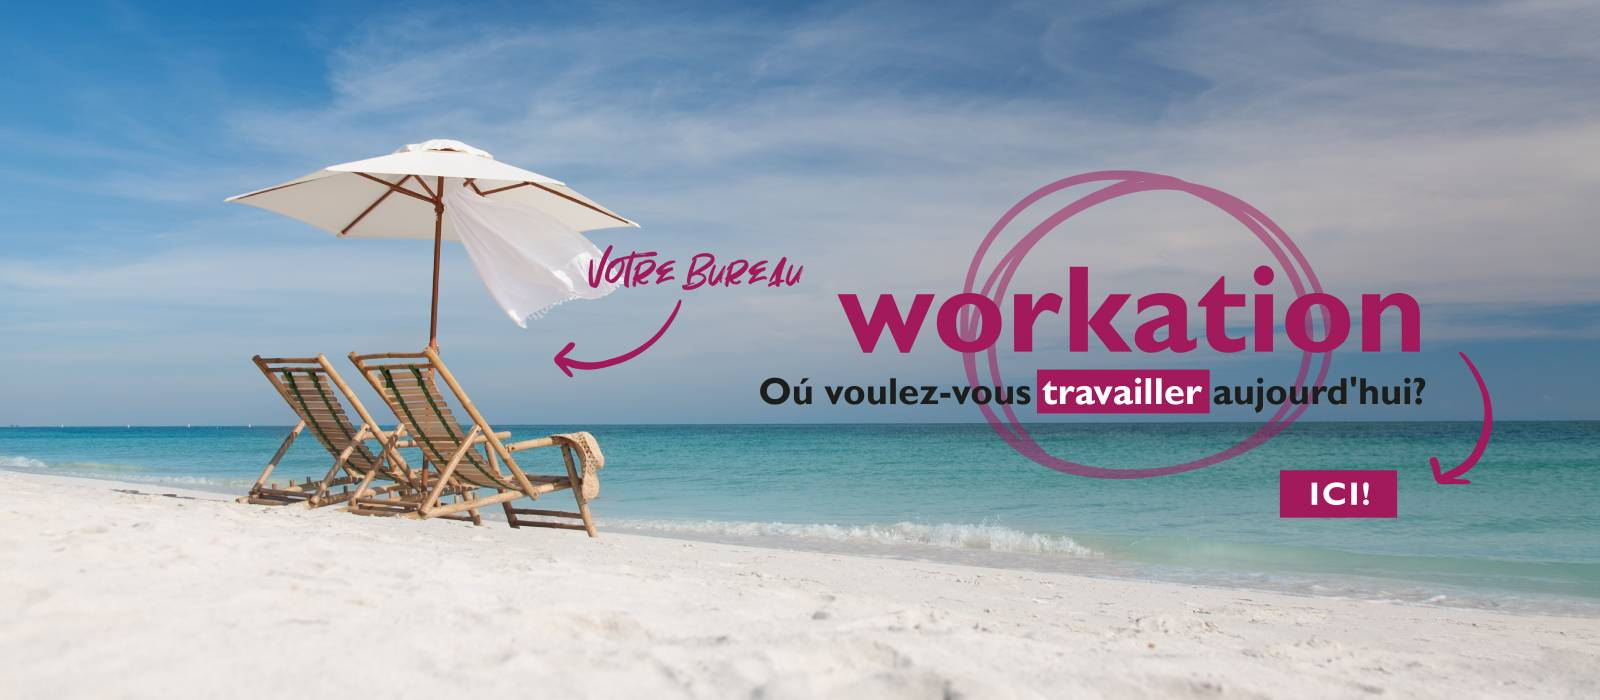 WORKATION FR